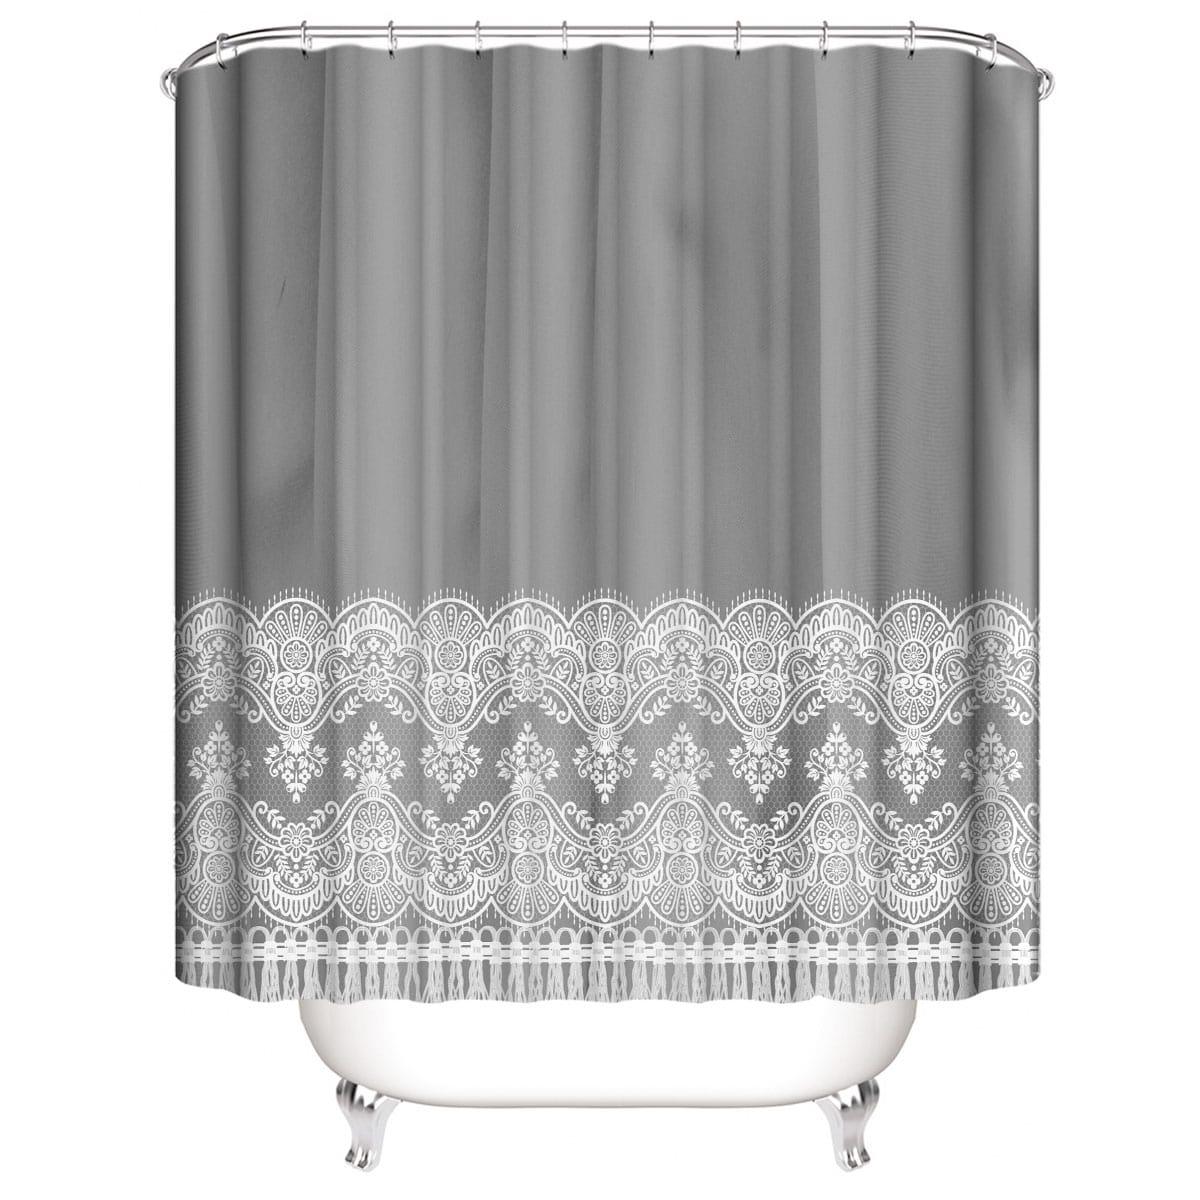 Flower Print Shower Curtain